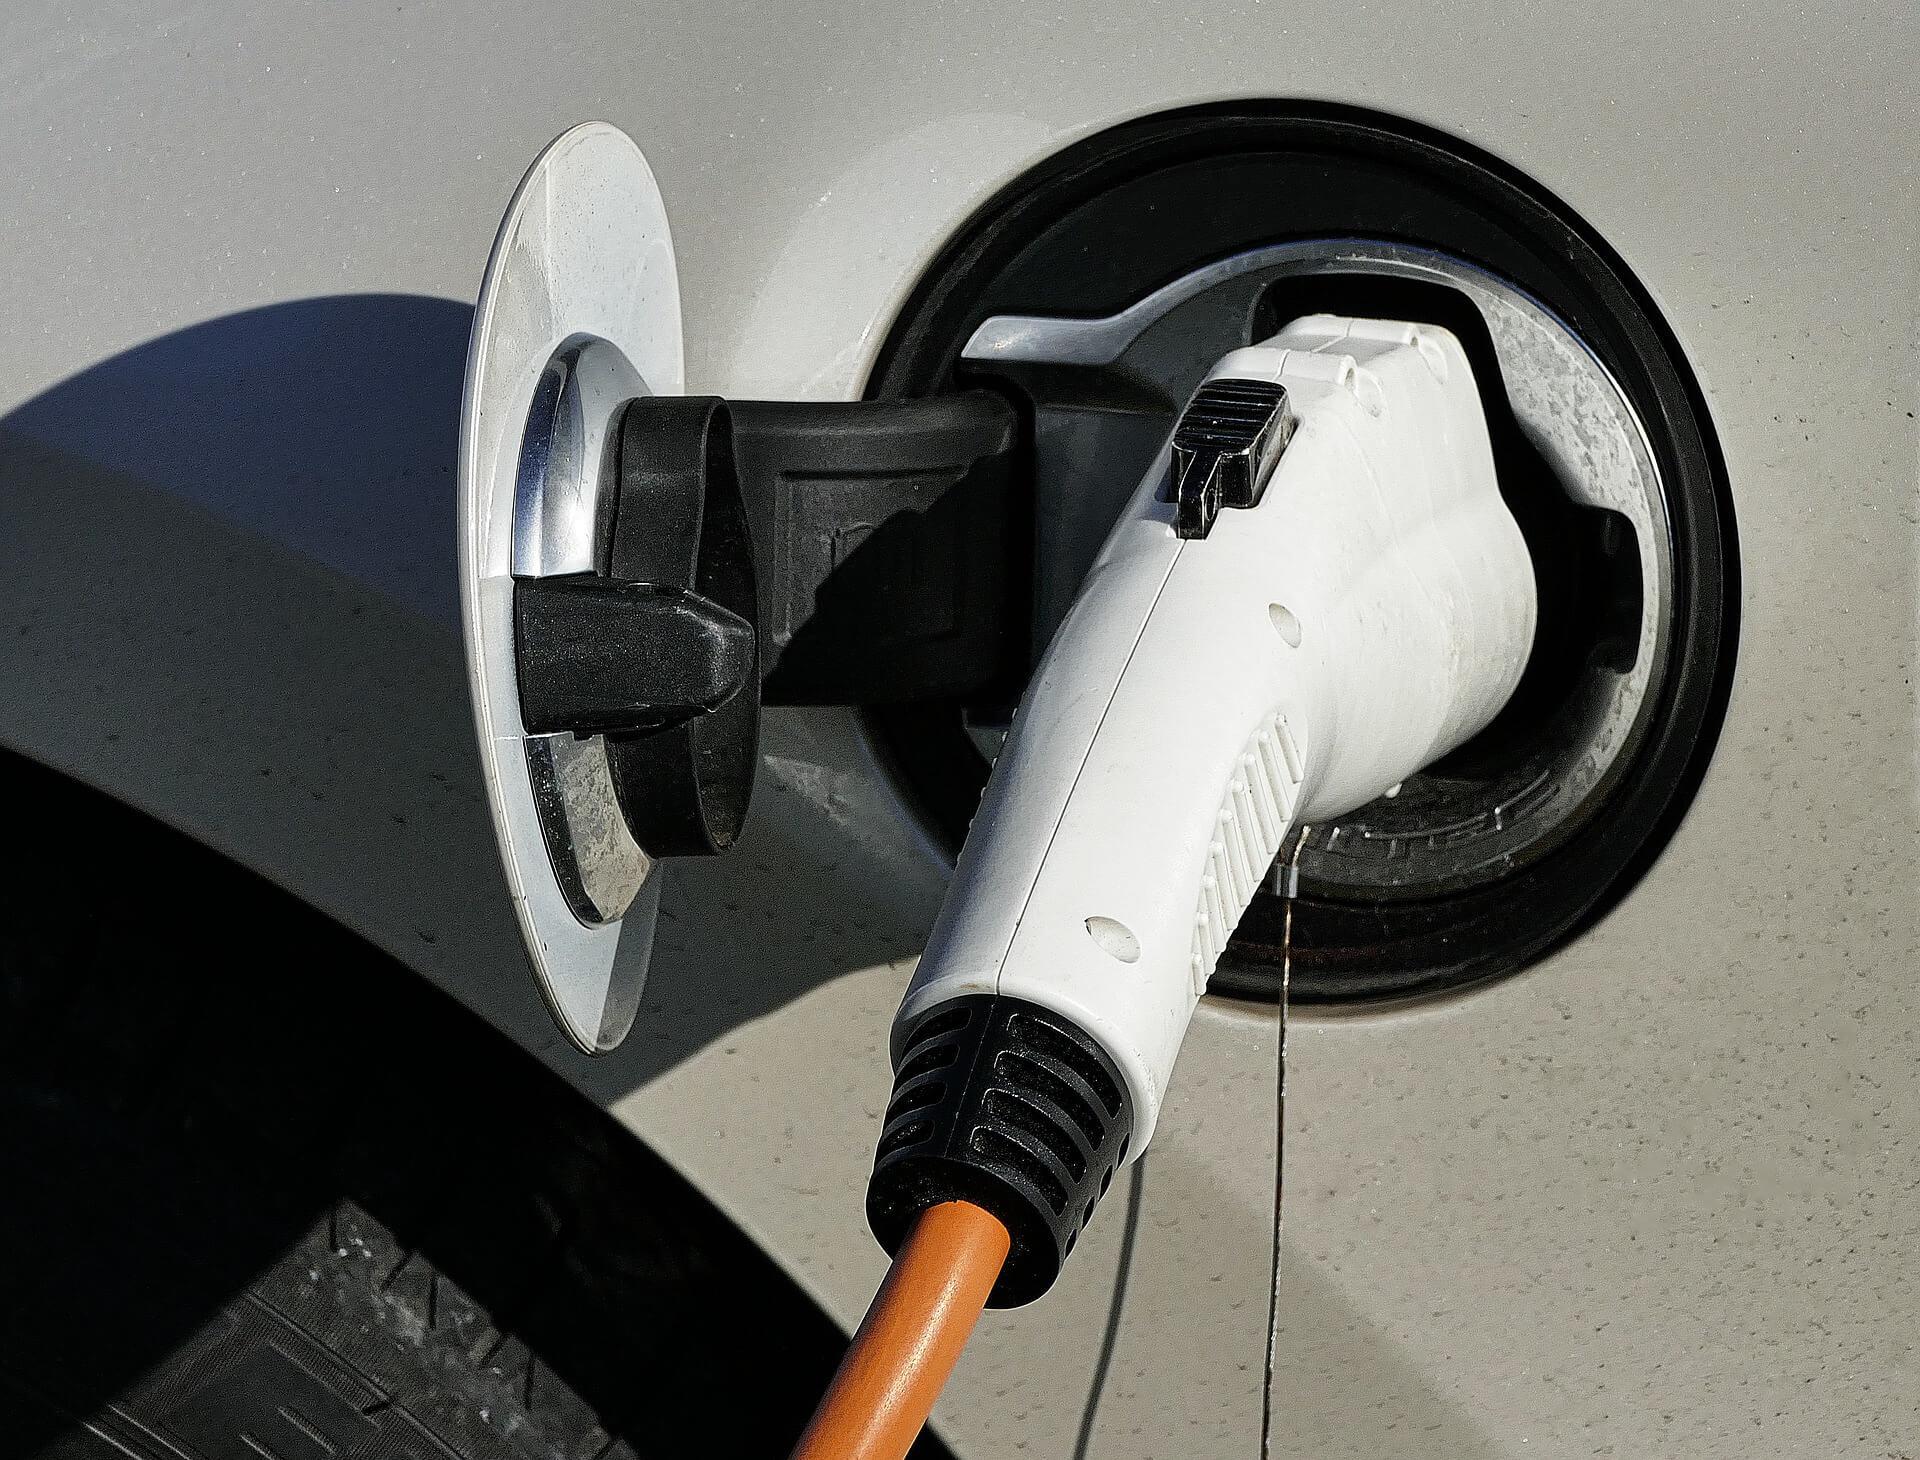 EV Charging plug in car